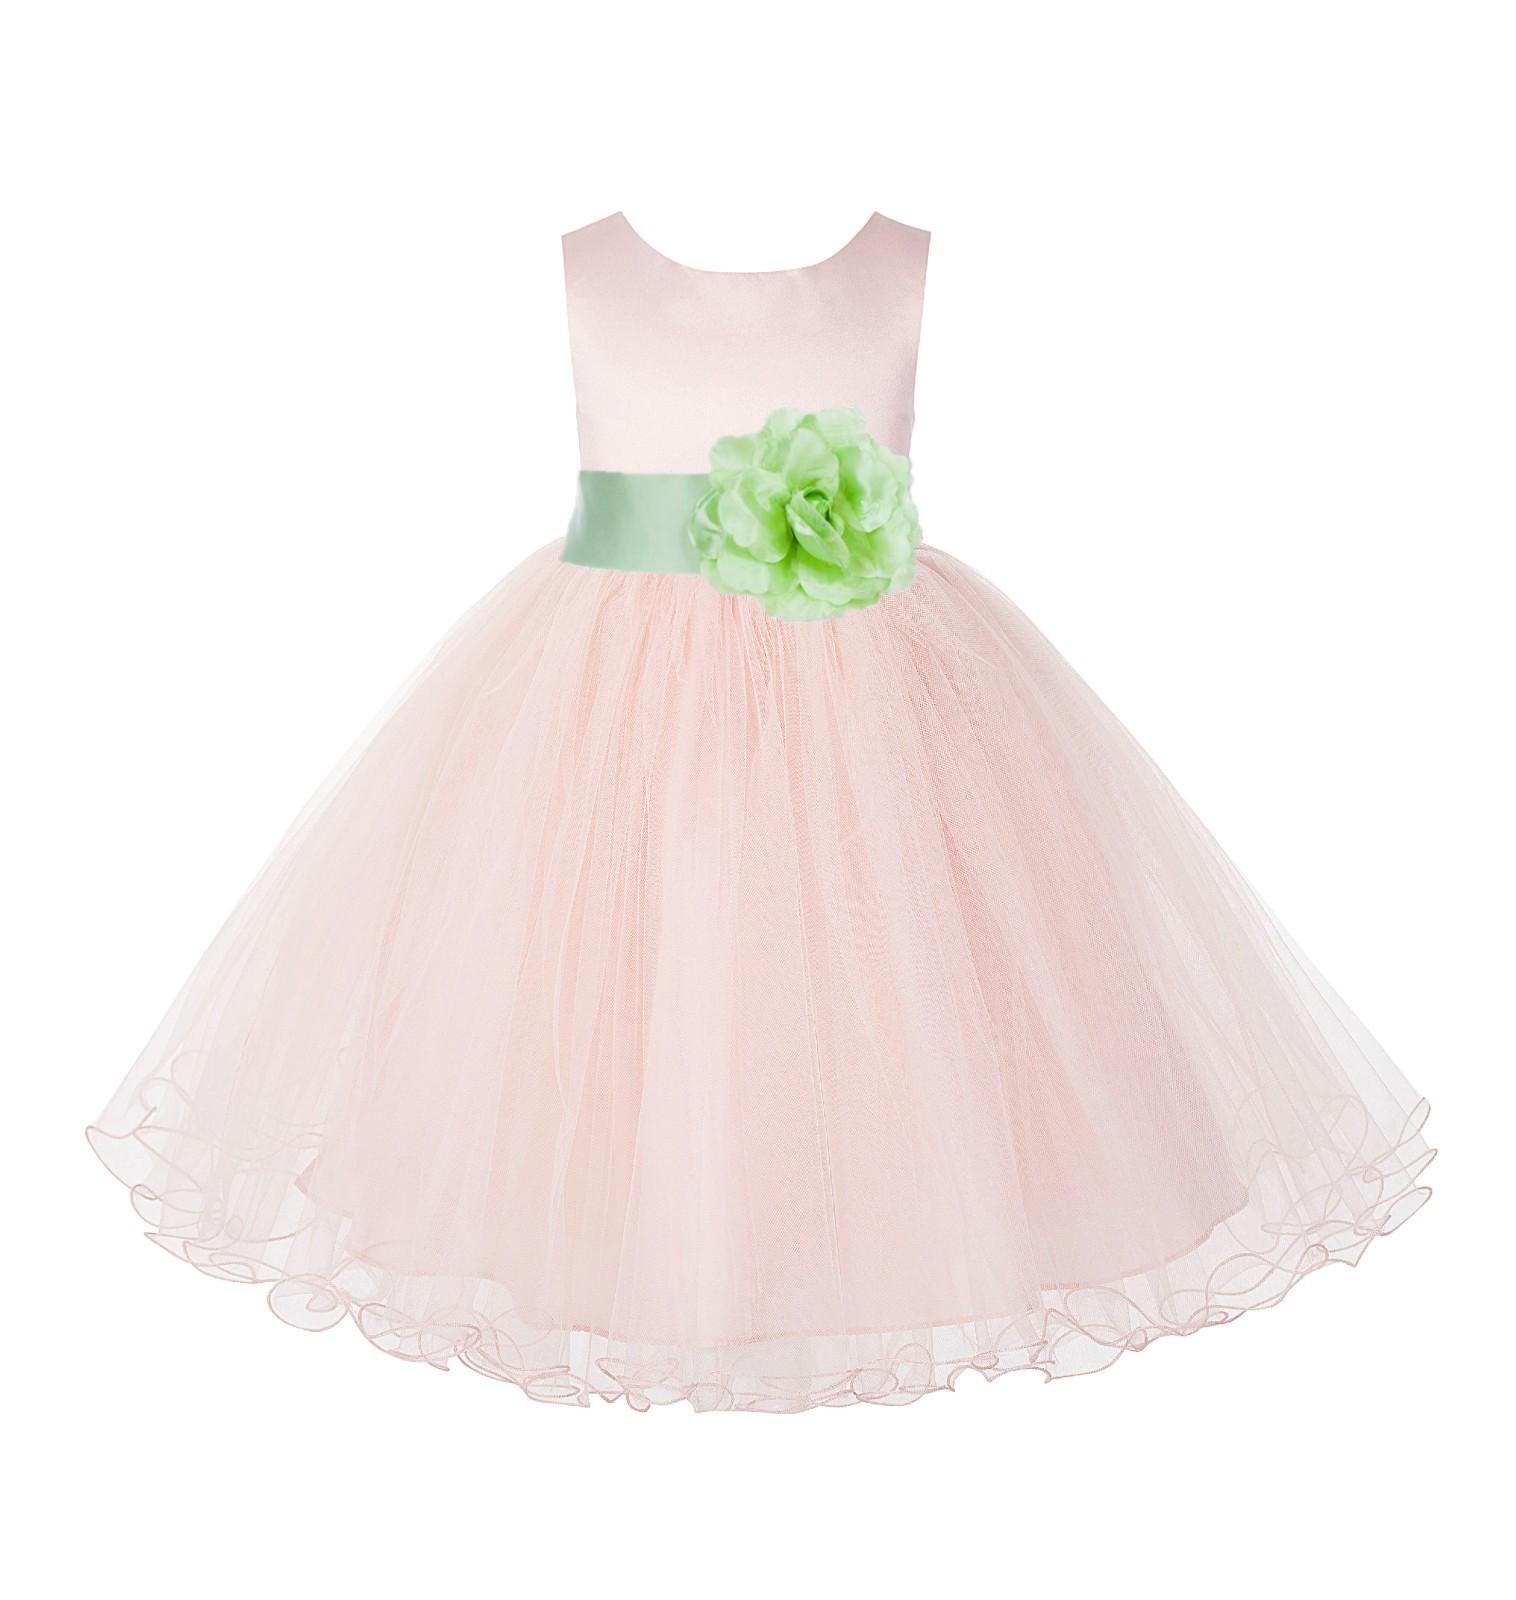 Blush Pink / Apple green Tulle Rattail Edge Flower Girl Dress Pageant Recital 829S